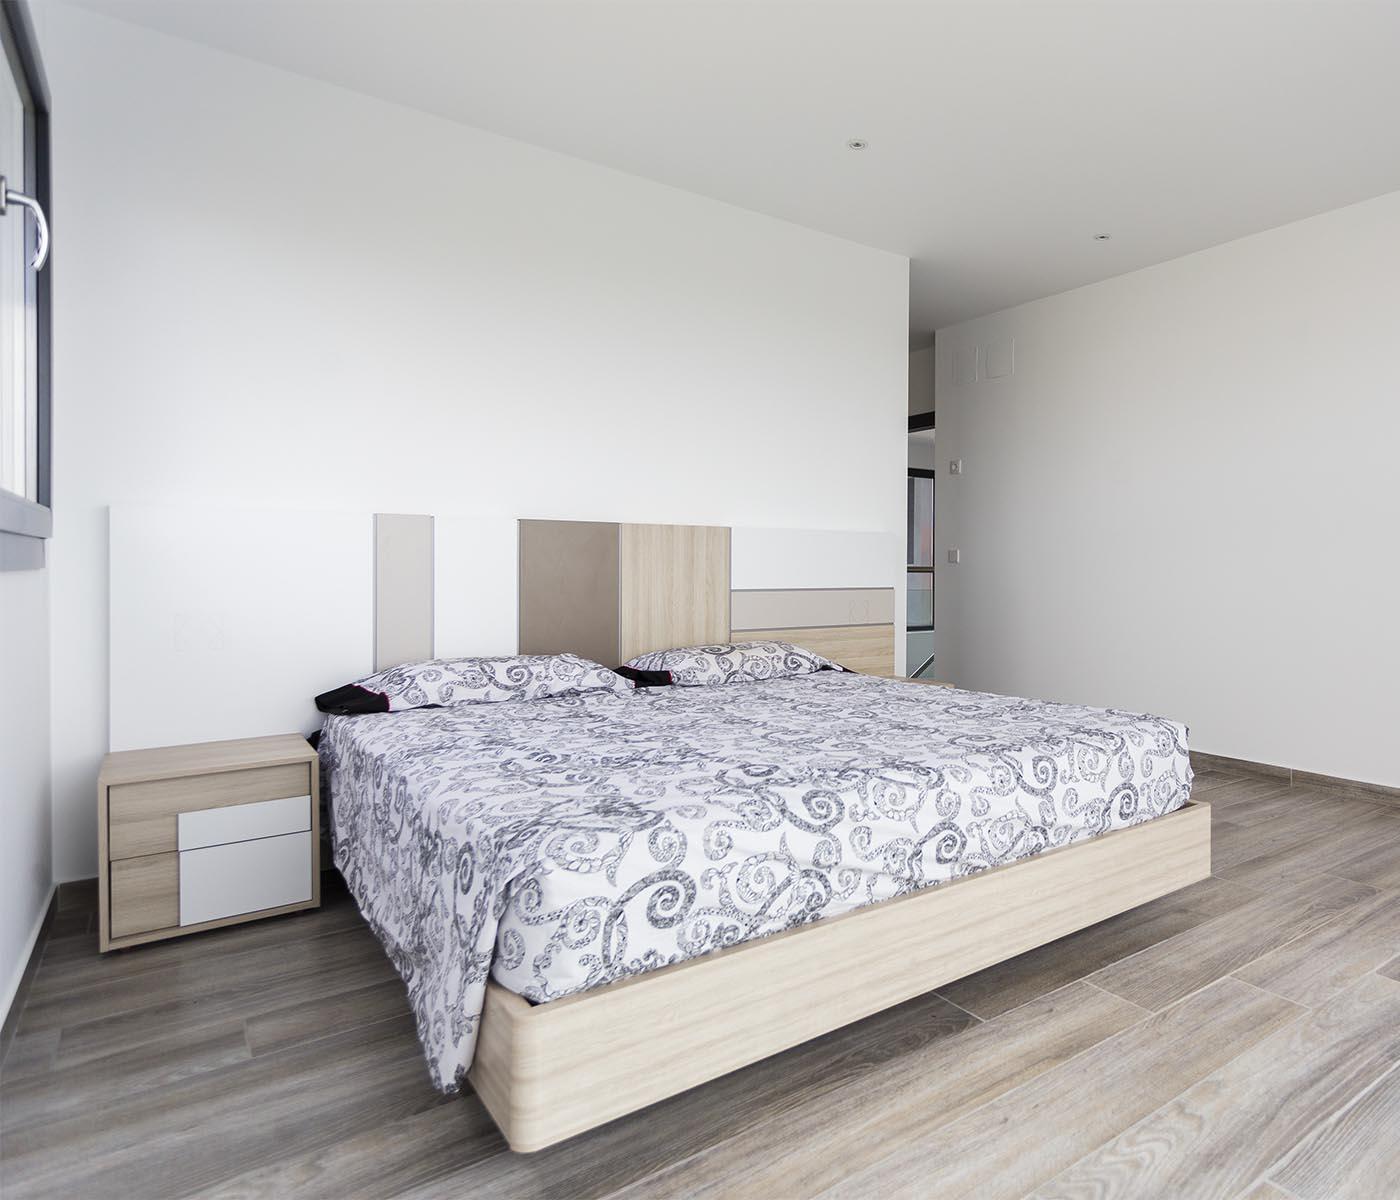 Dormitori smarthome